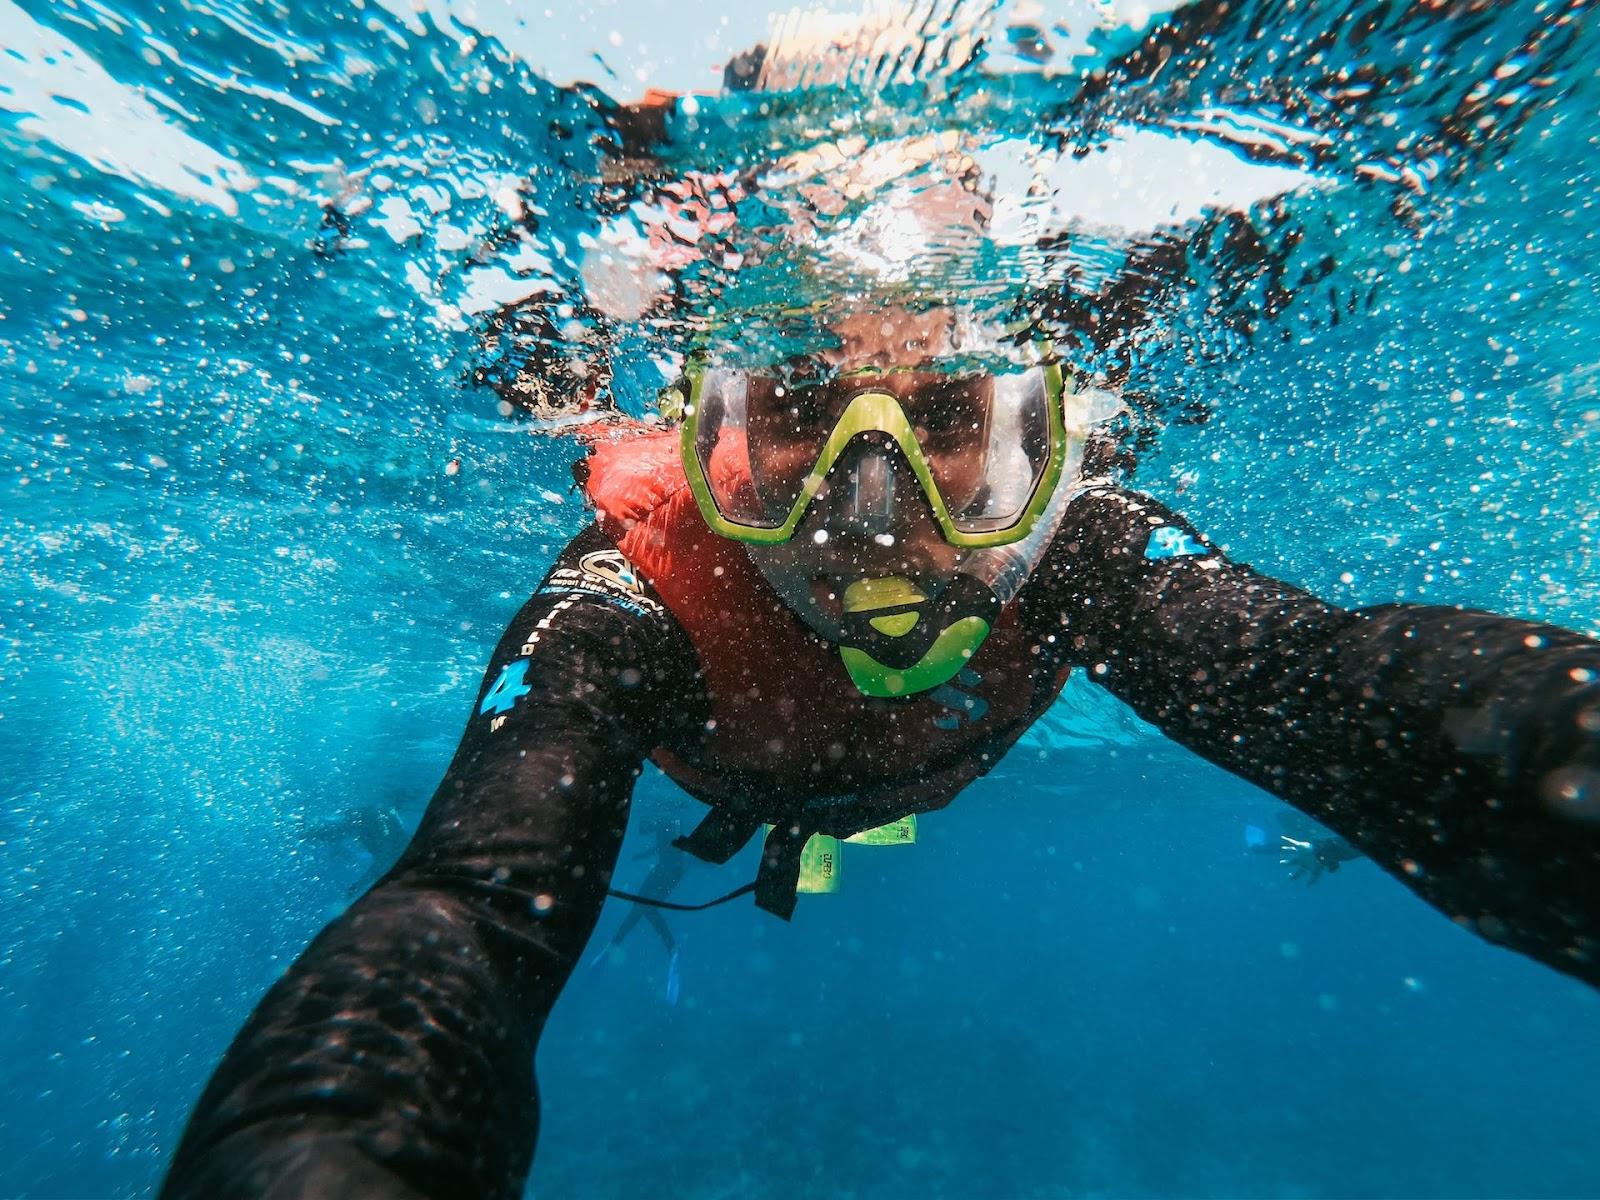 Snorkeling-water-sports-in-kauai